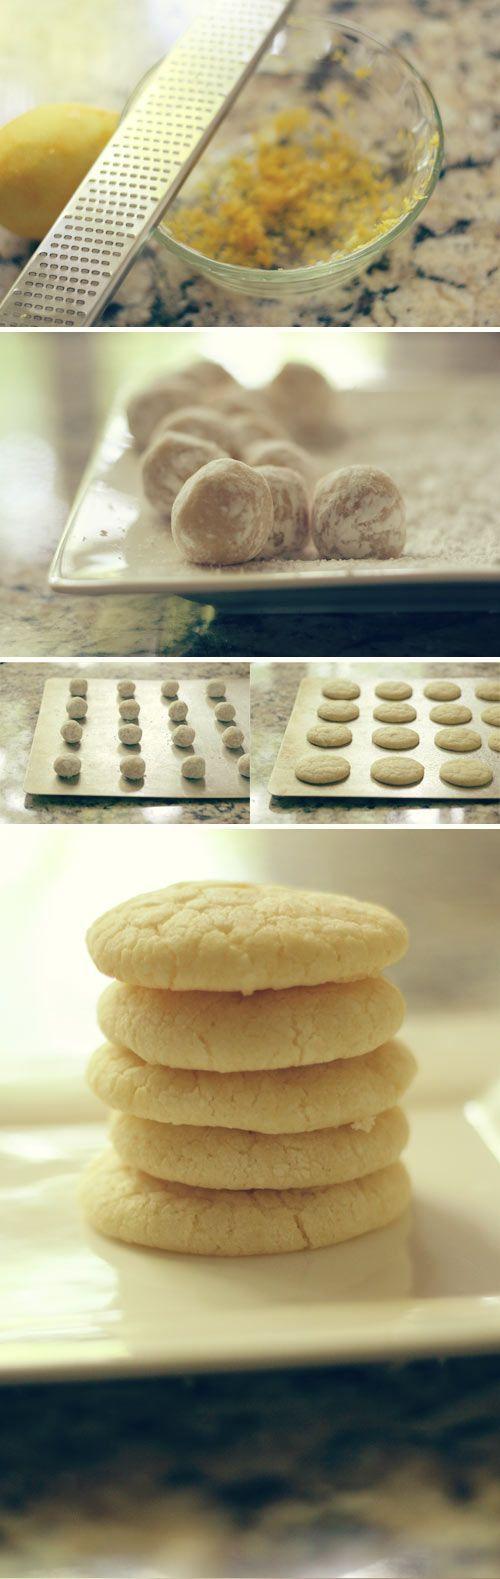 lemon crinkle cookies (scheduled via http://www.tailwindapp.com?utm_source=pinterest&utm_medium=twpin&utm_content=post324307&utm_campaign=scheduler_attribution)